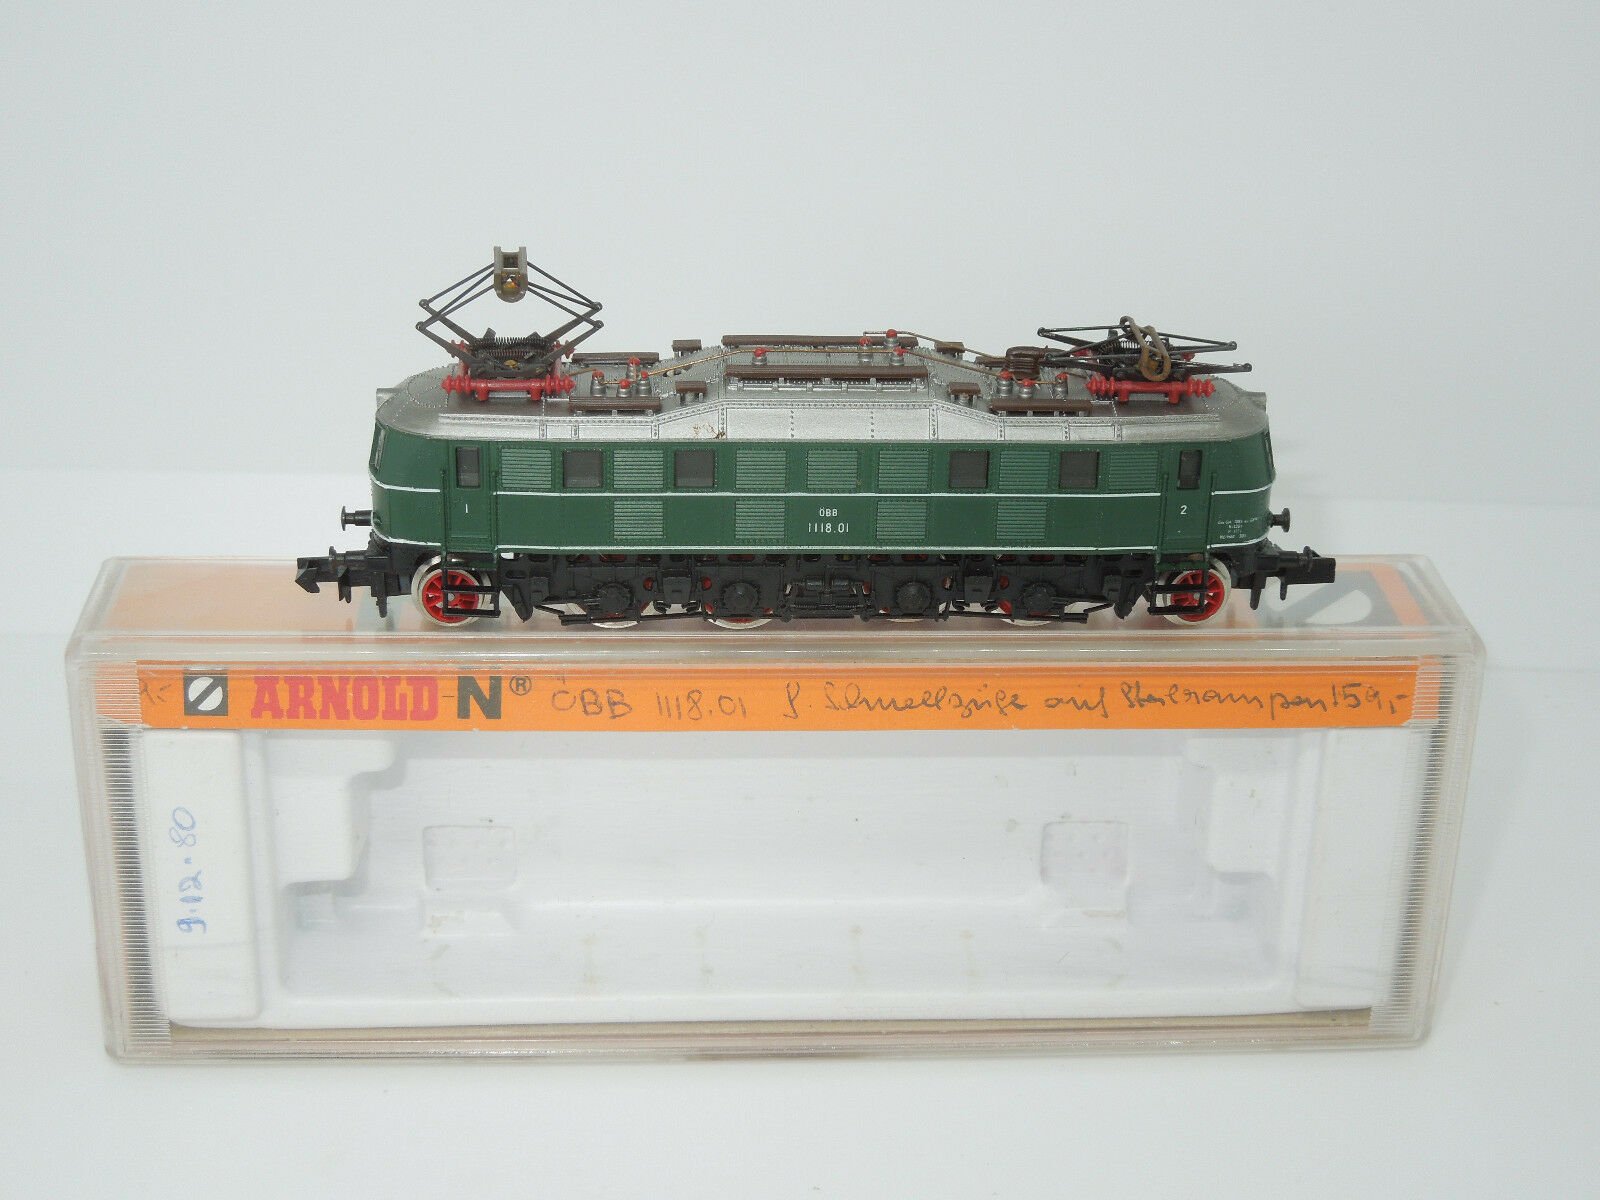 Arnold Spur N 2454 E-Lok 1118.01 1118.01 1118.01 der ÖBB grün a1a3ef